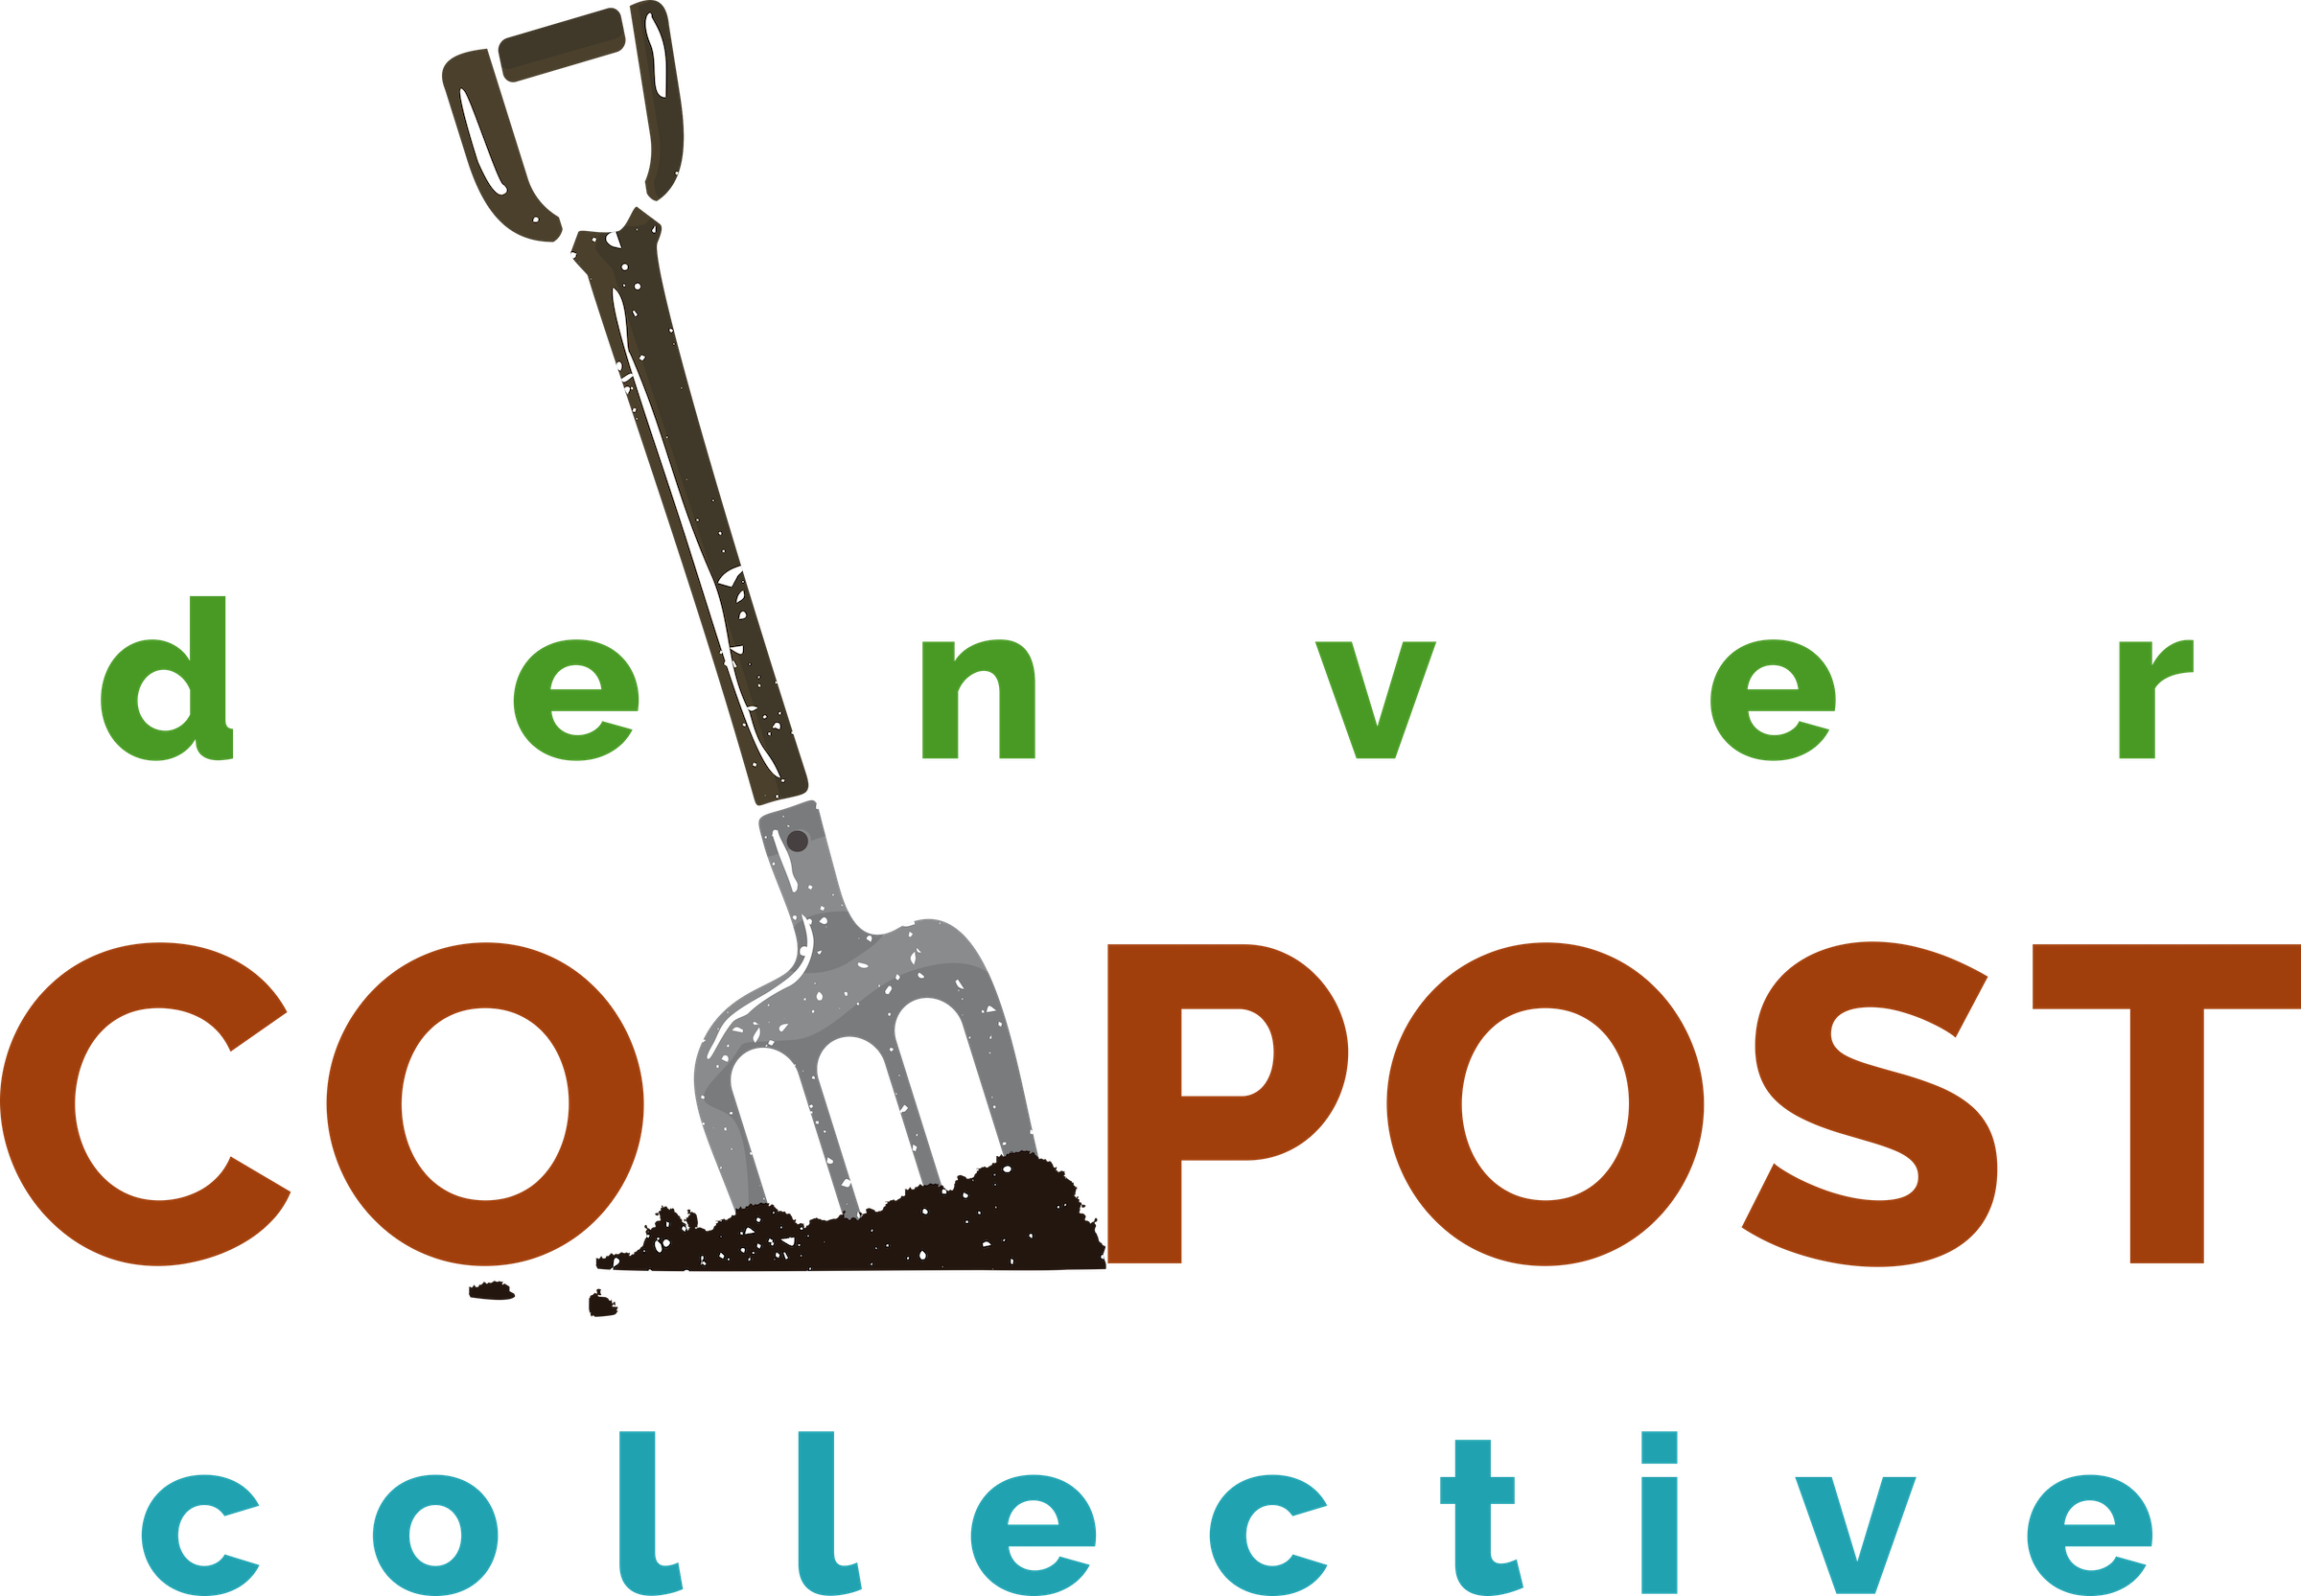 Denver Compost Collective